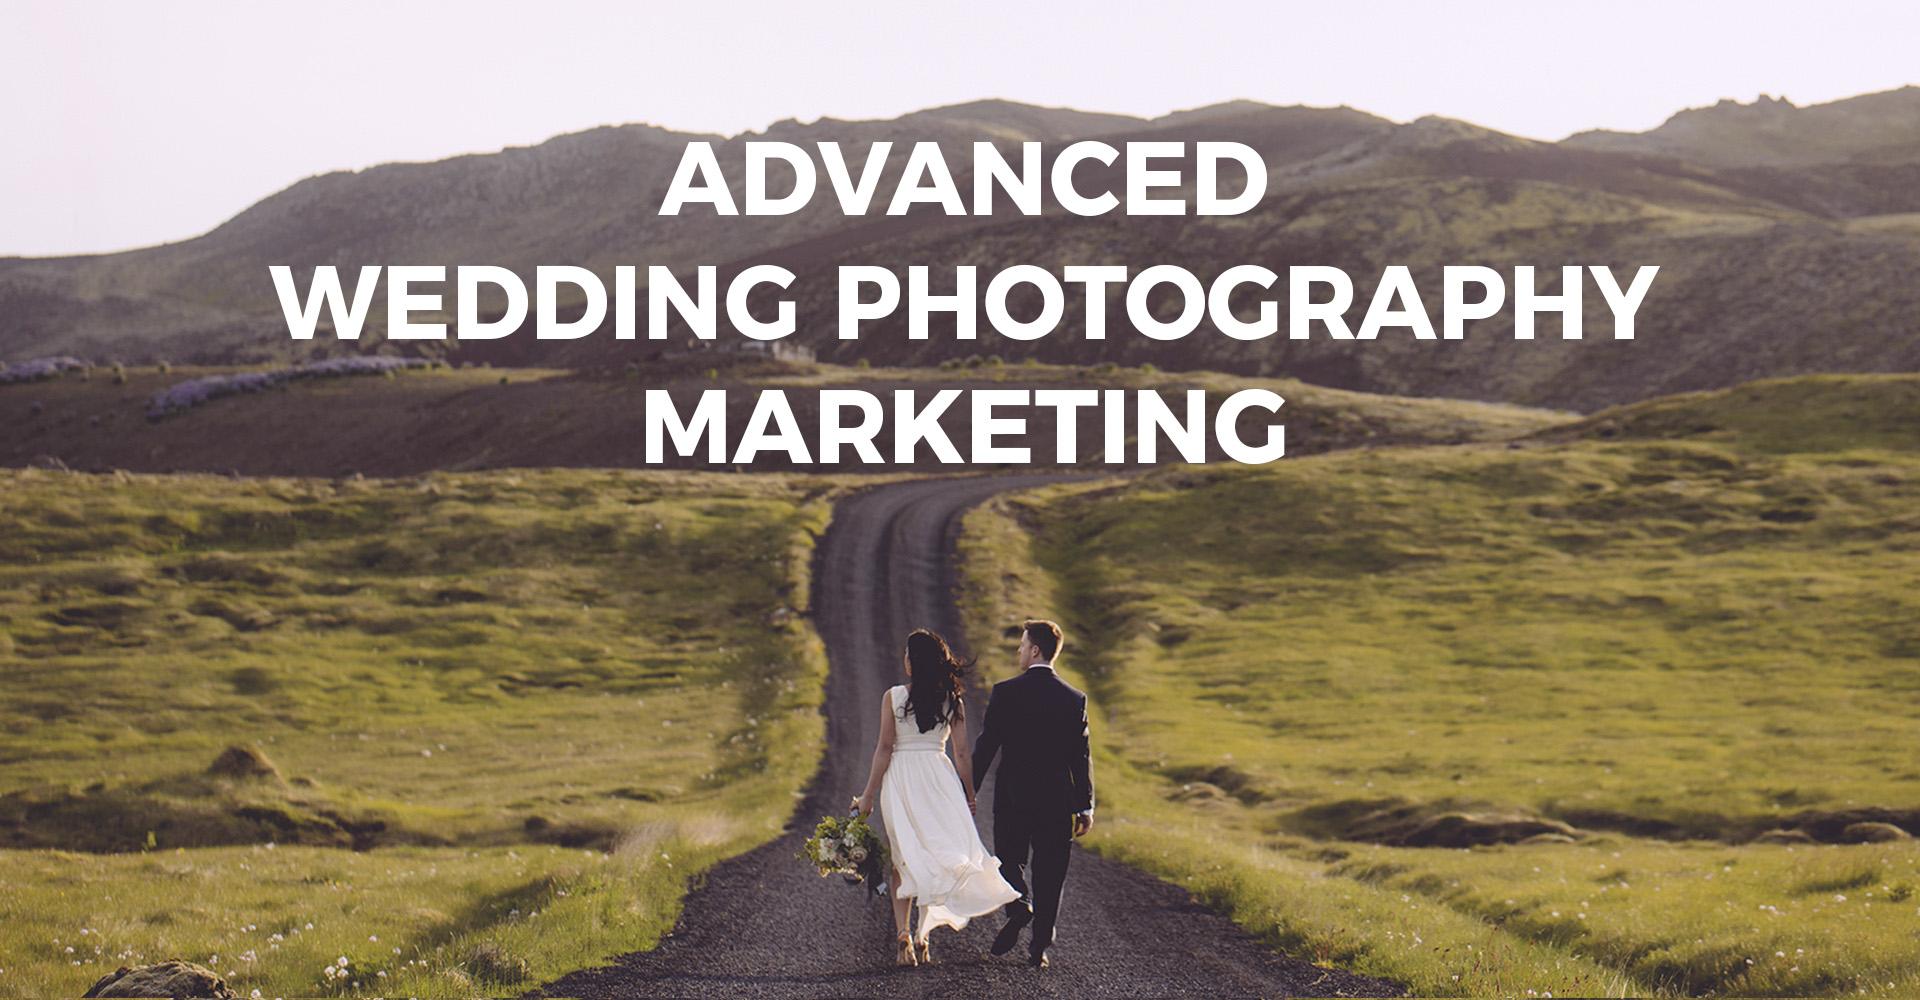 https://taylorjackson.podia.com/advanced-wedding-photography-marketing